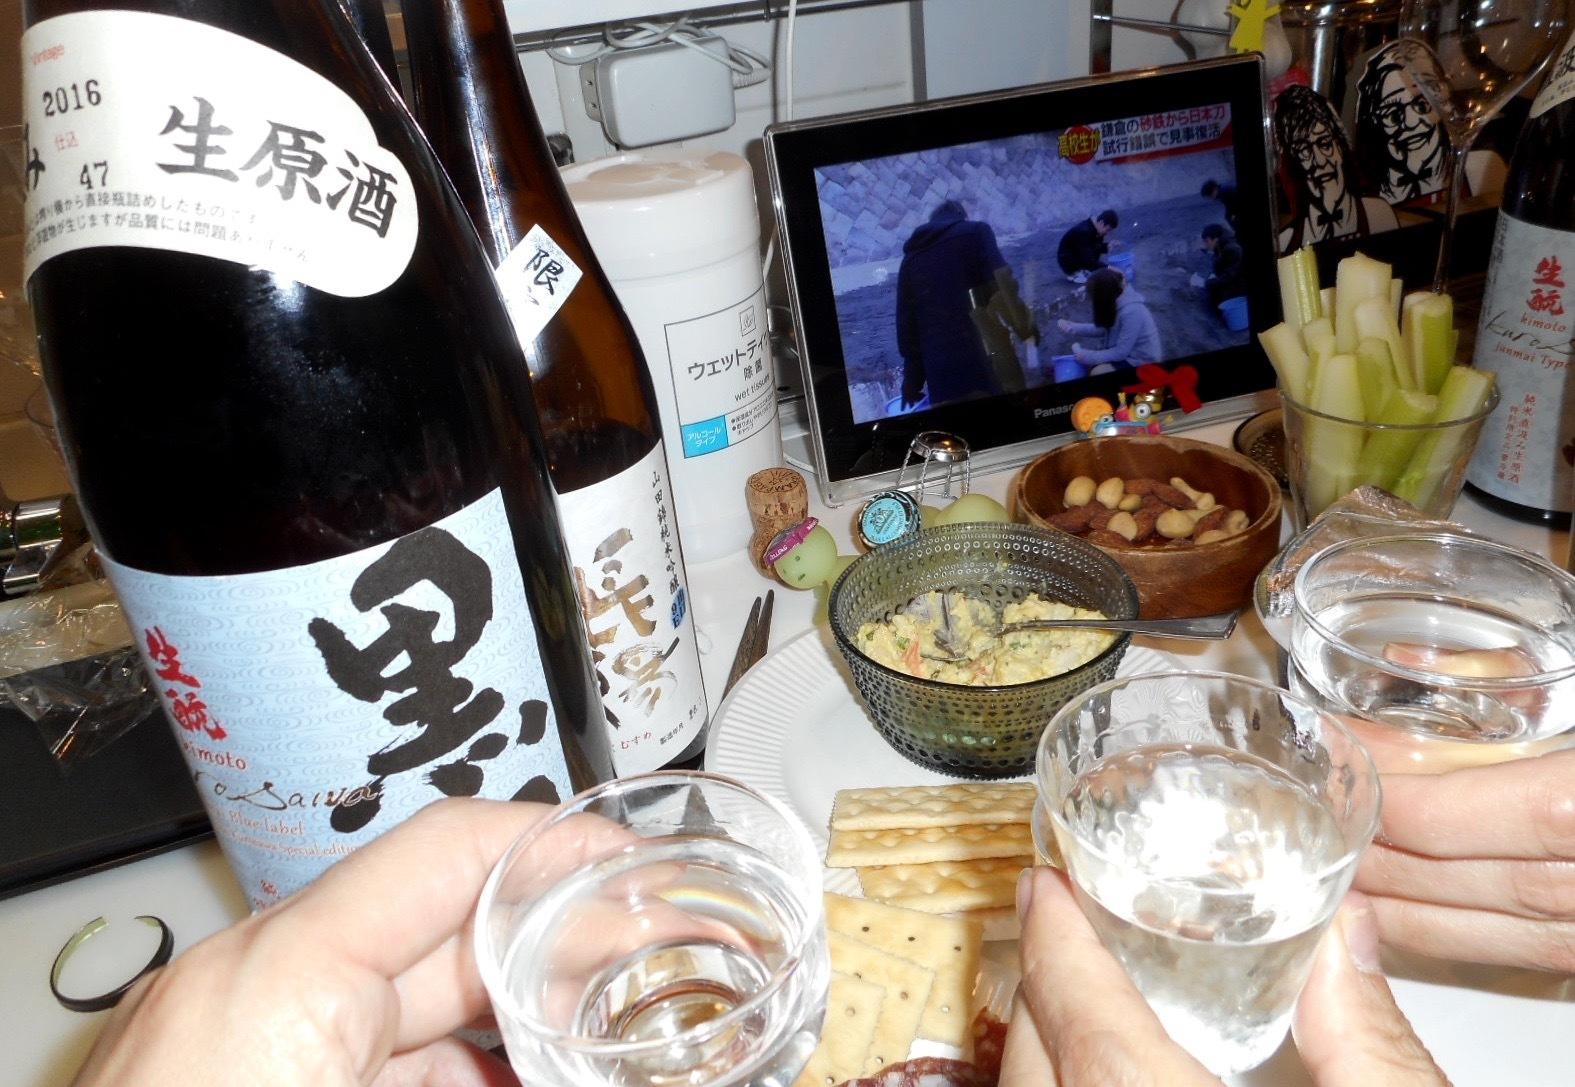 kurosawa_jikagumi_blue28by2.jpg